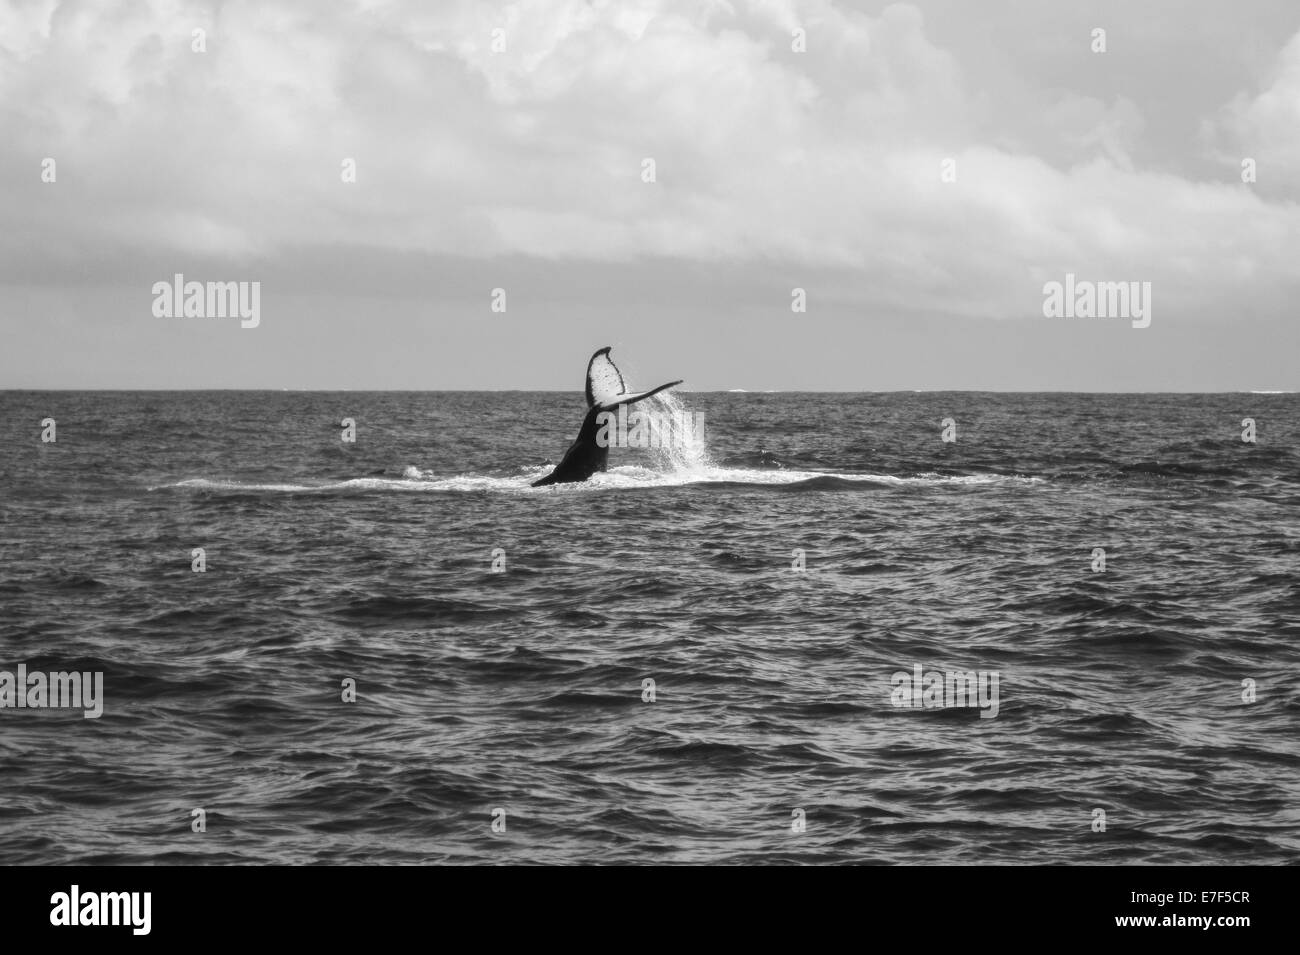 La ballena jorobada (Megaptera novaeangliae), buceo con un Fluke levantada, el Océano Índico, Sainte Marie, Nosy Boraha, Madagascar Foto de stock